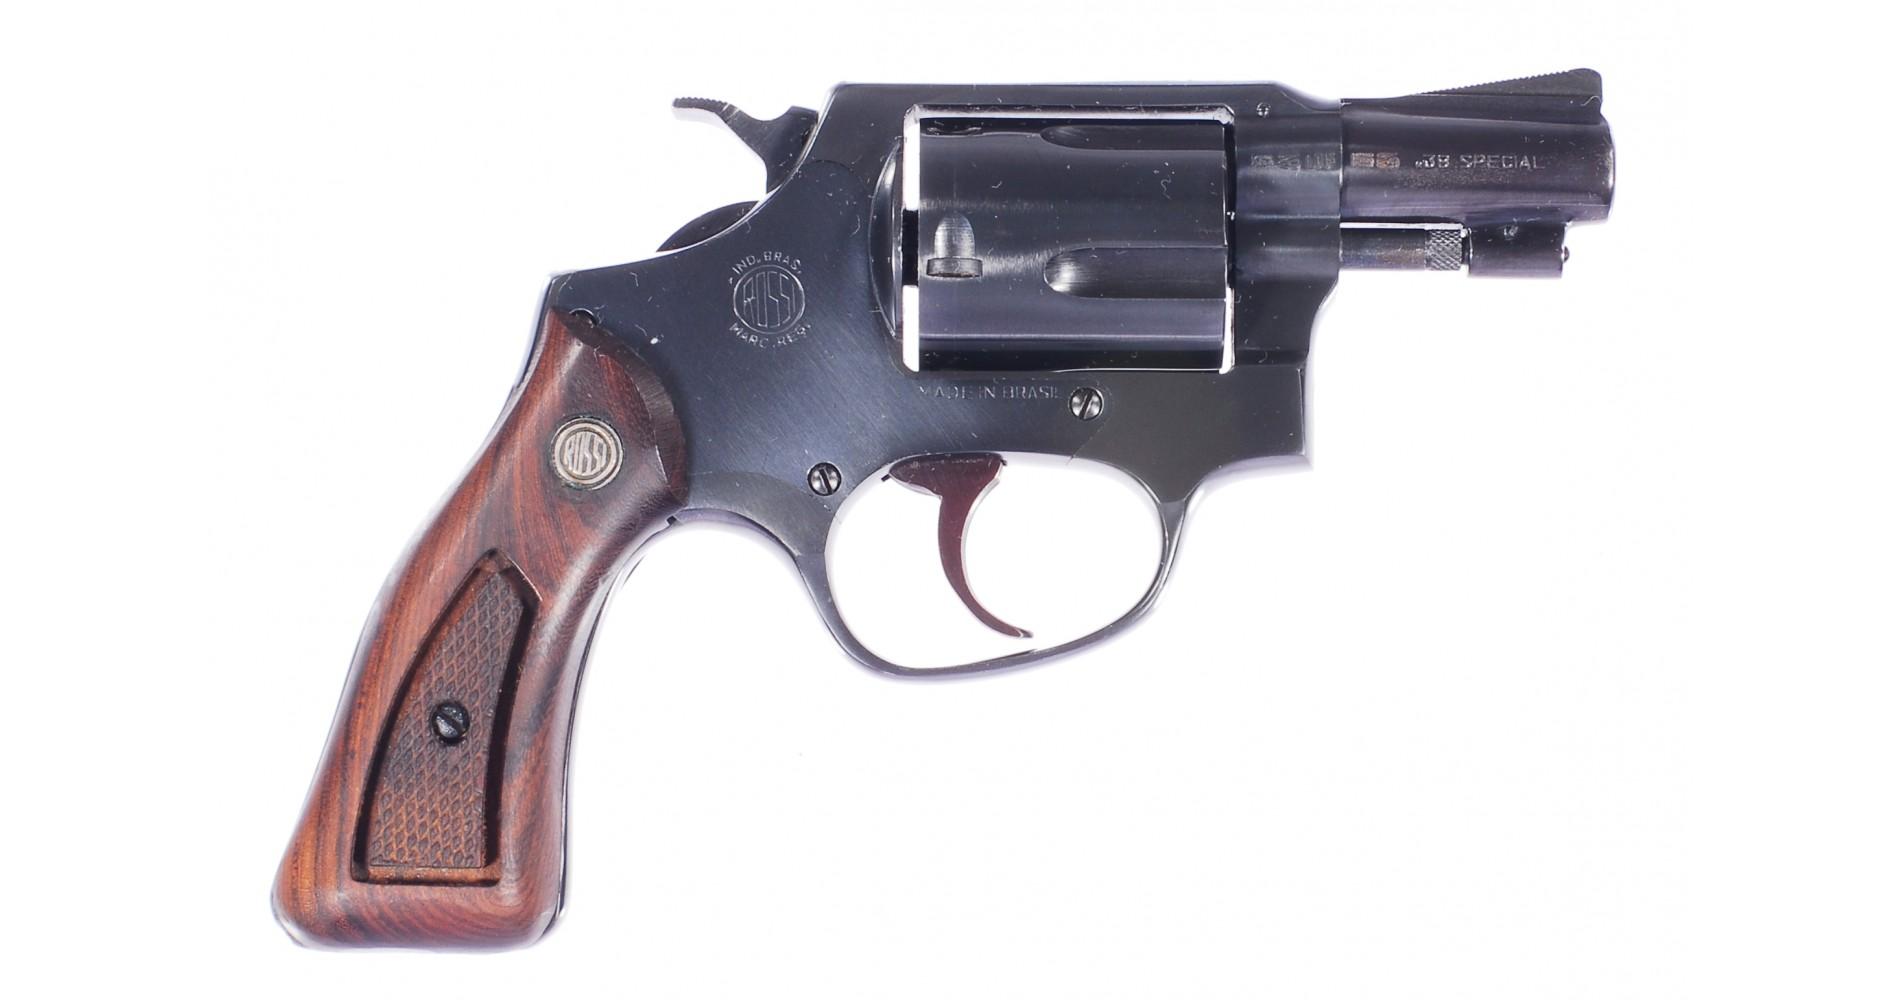 Fotos - Rossi Amadeo Rossi 38 Special Revolver